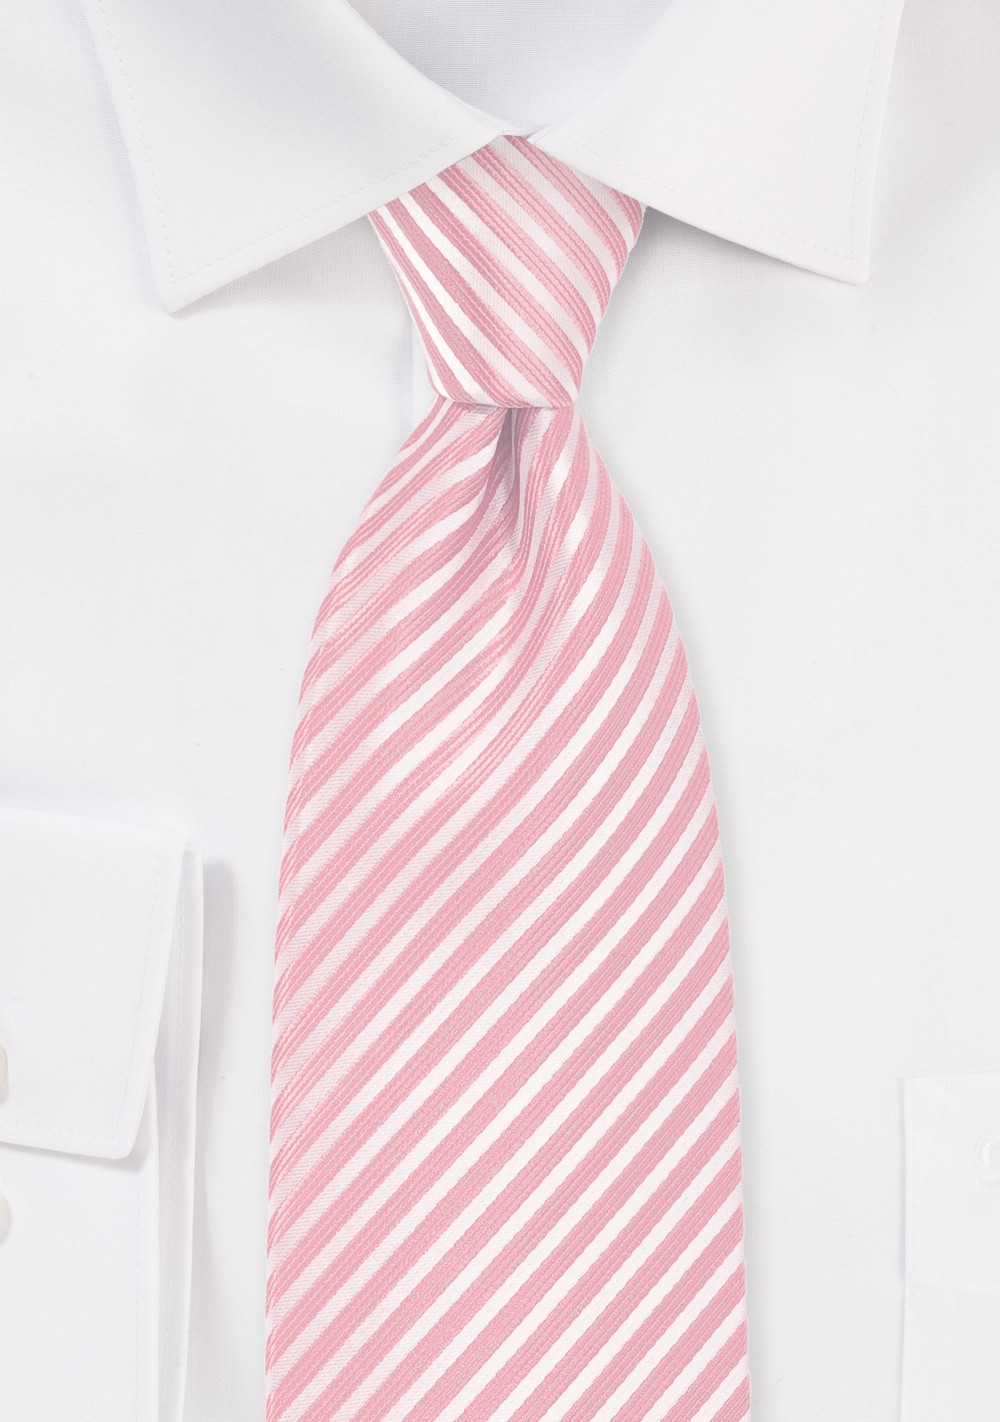 Petal Pink Kids Necktie with Stripes